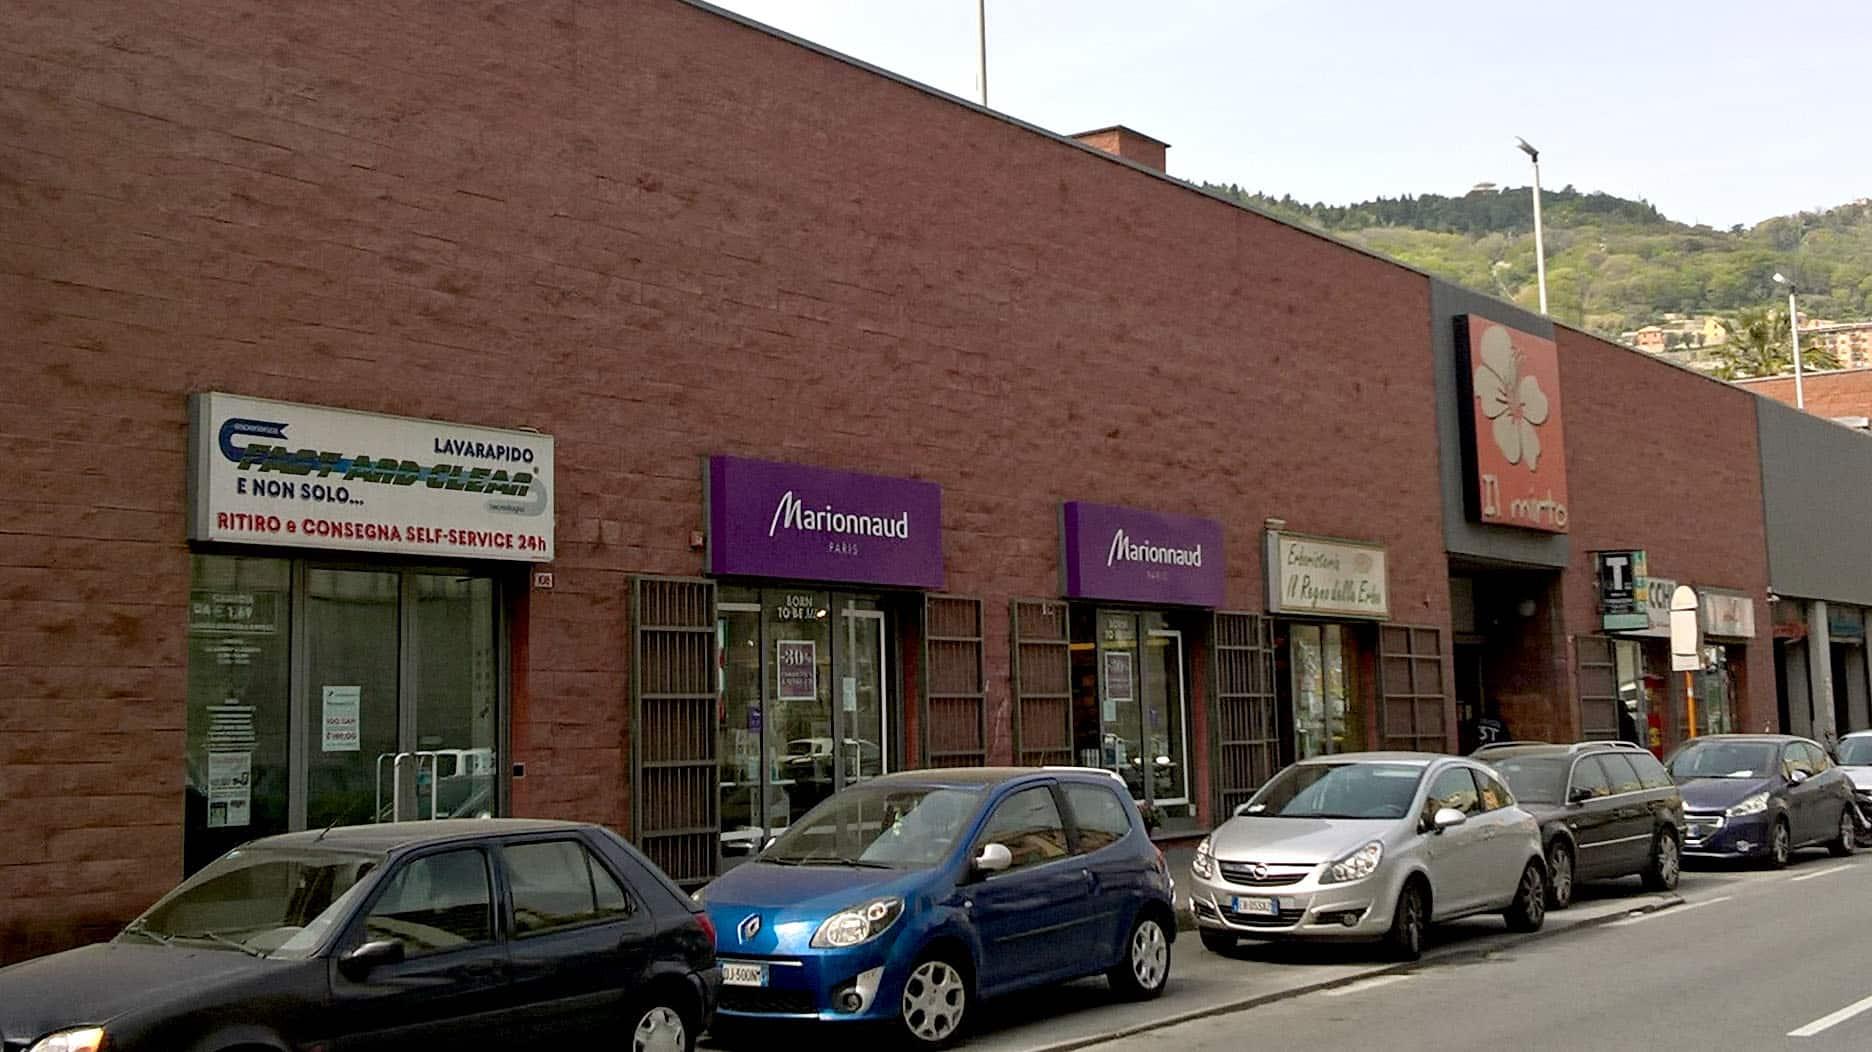 Centro Commerciale I Leudi Carasco